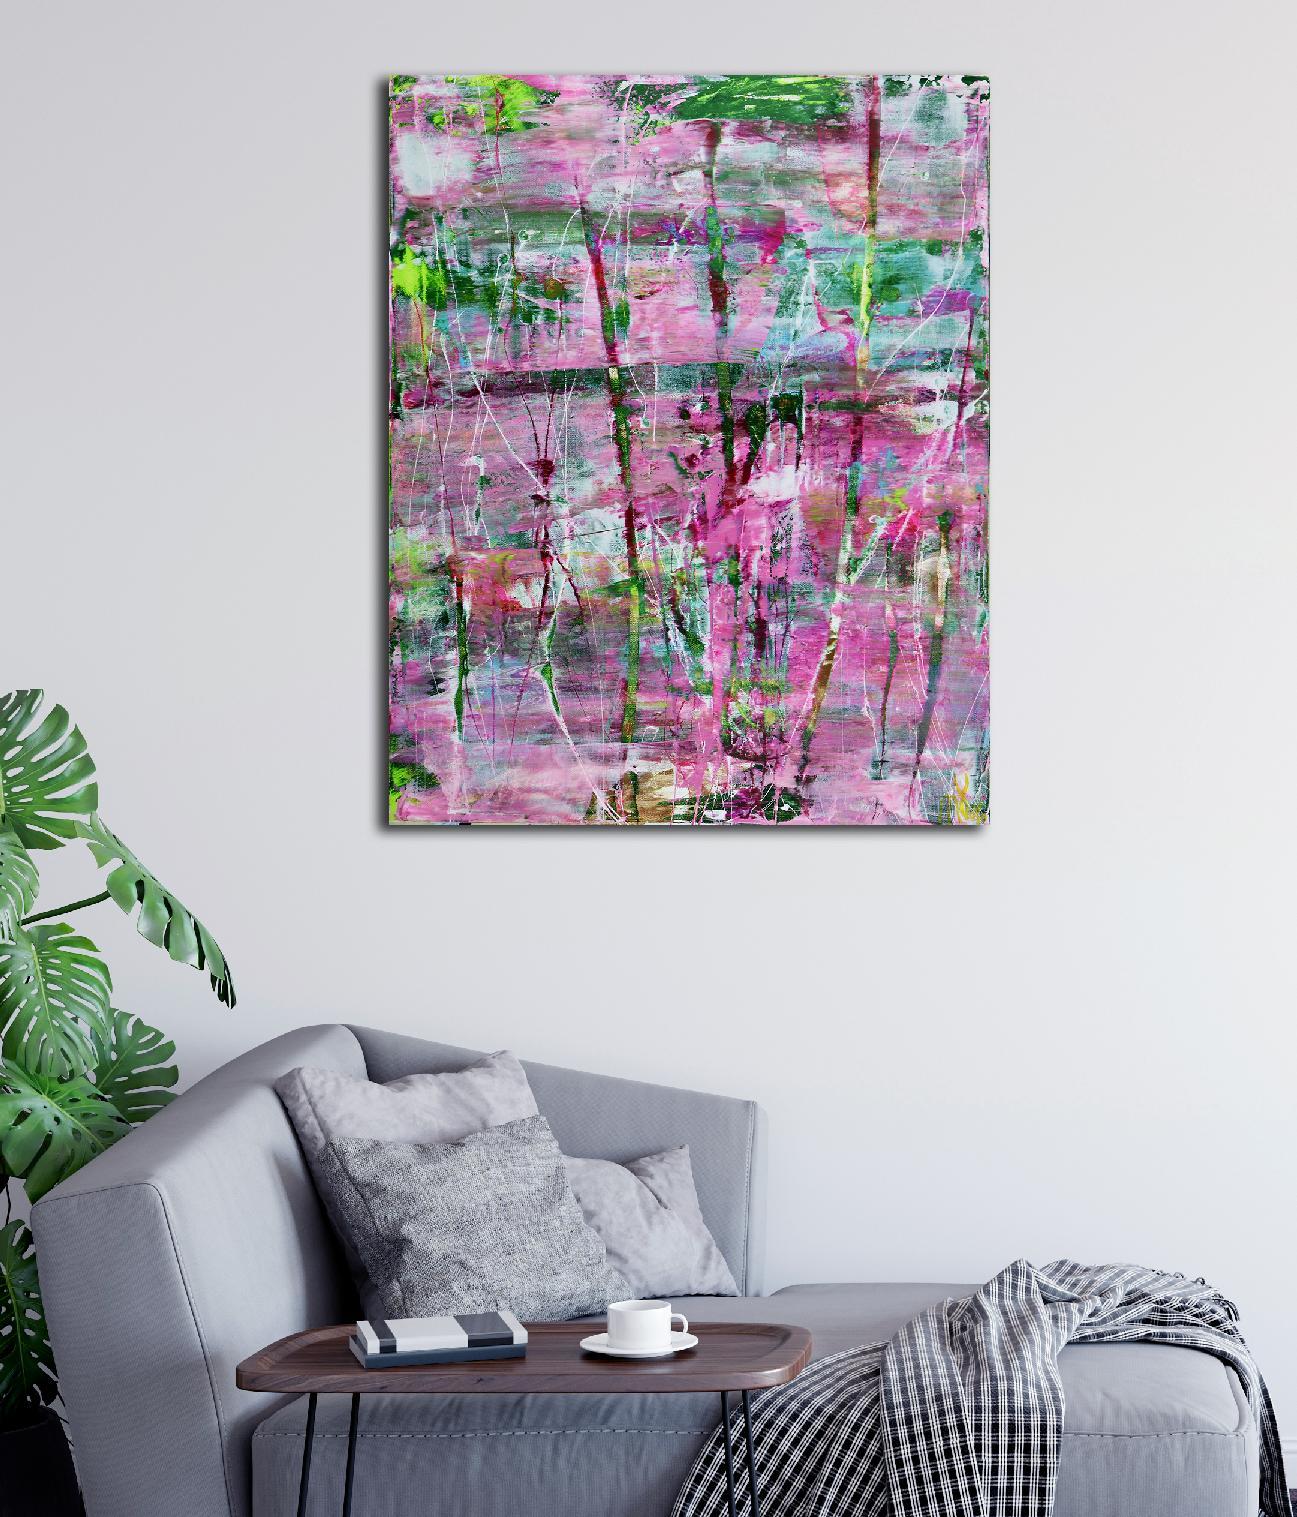 Full Image - 30x24 inches - A Closer Look (Avant Garden) 2 (2020) by Nestor Toro - Los Angeles